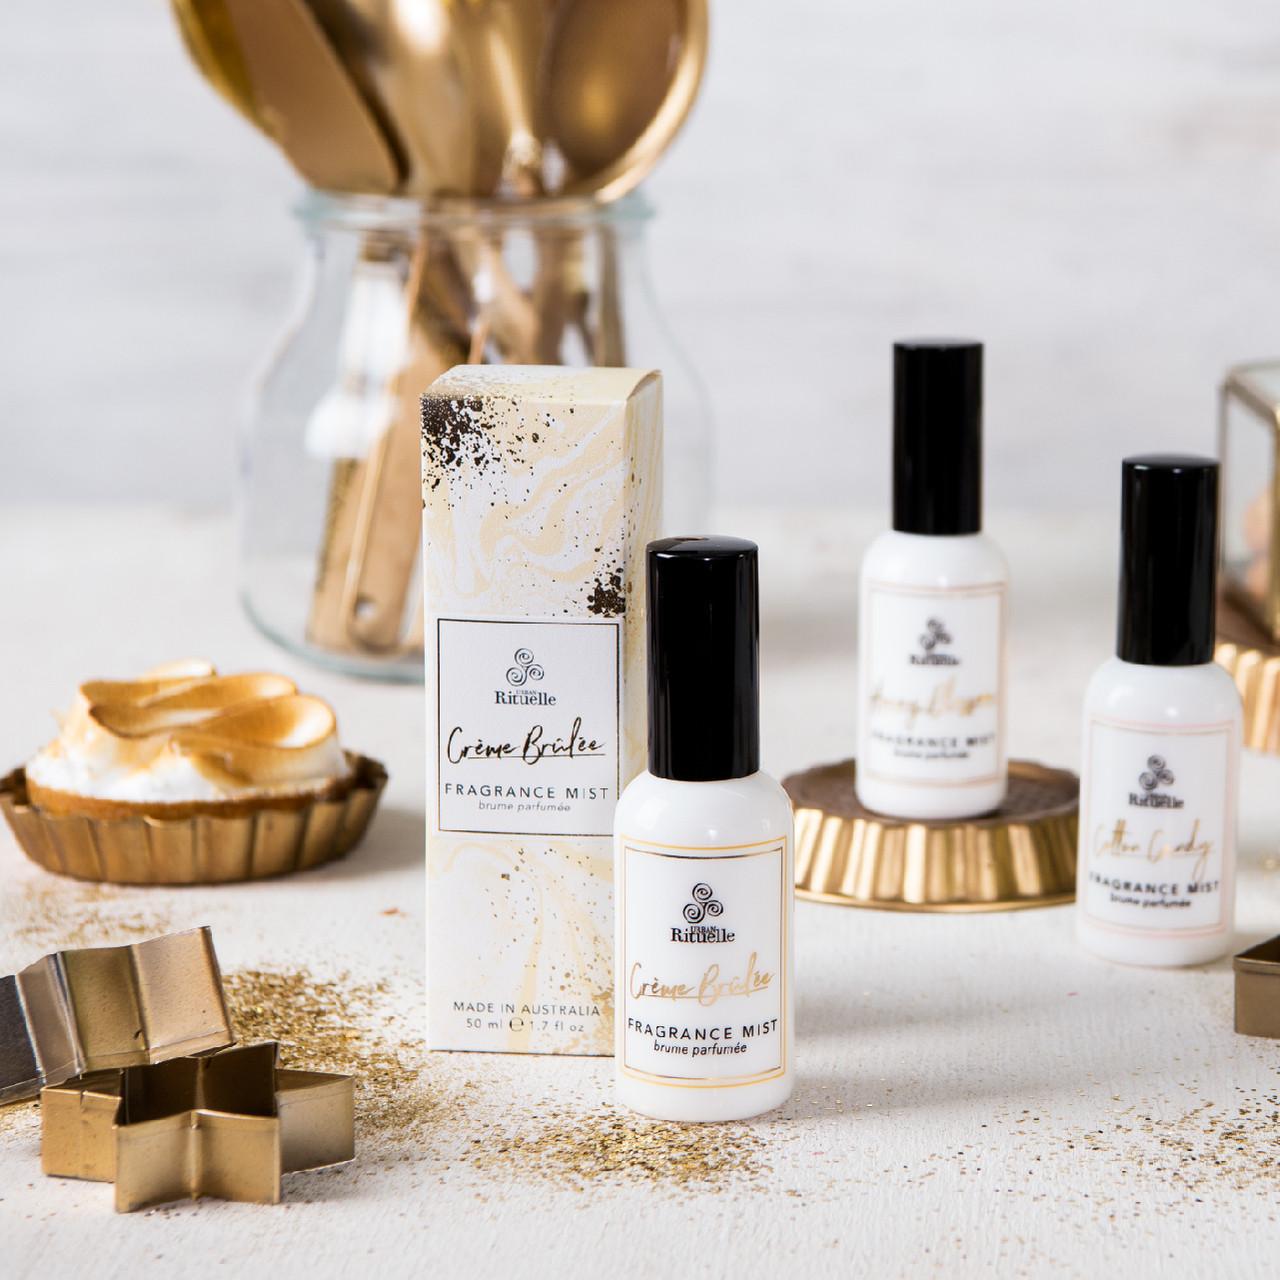 Sweet Treats - Fragrance Mist - Urban Rituelle